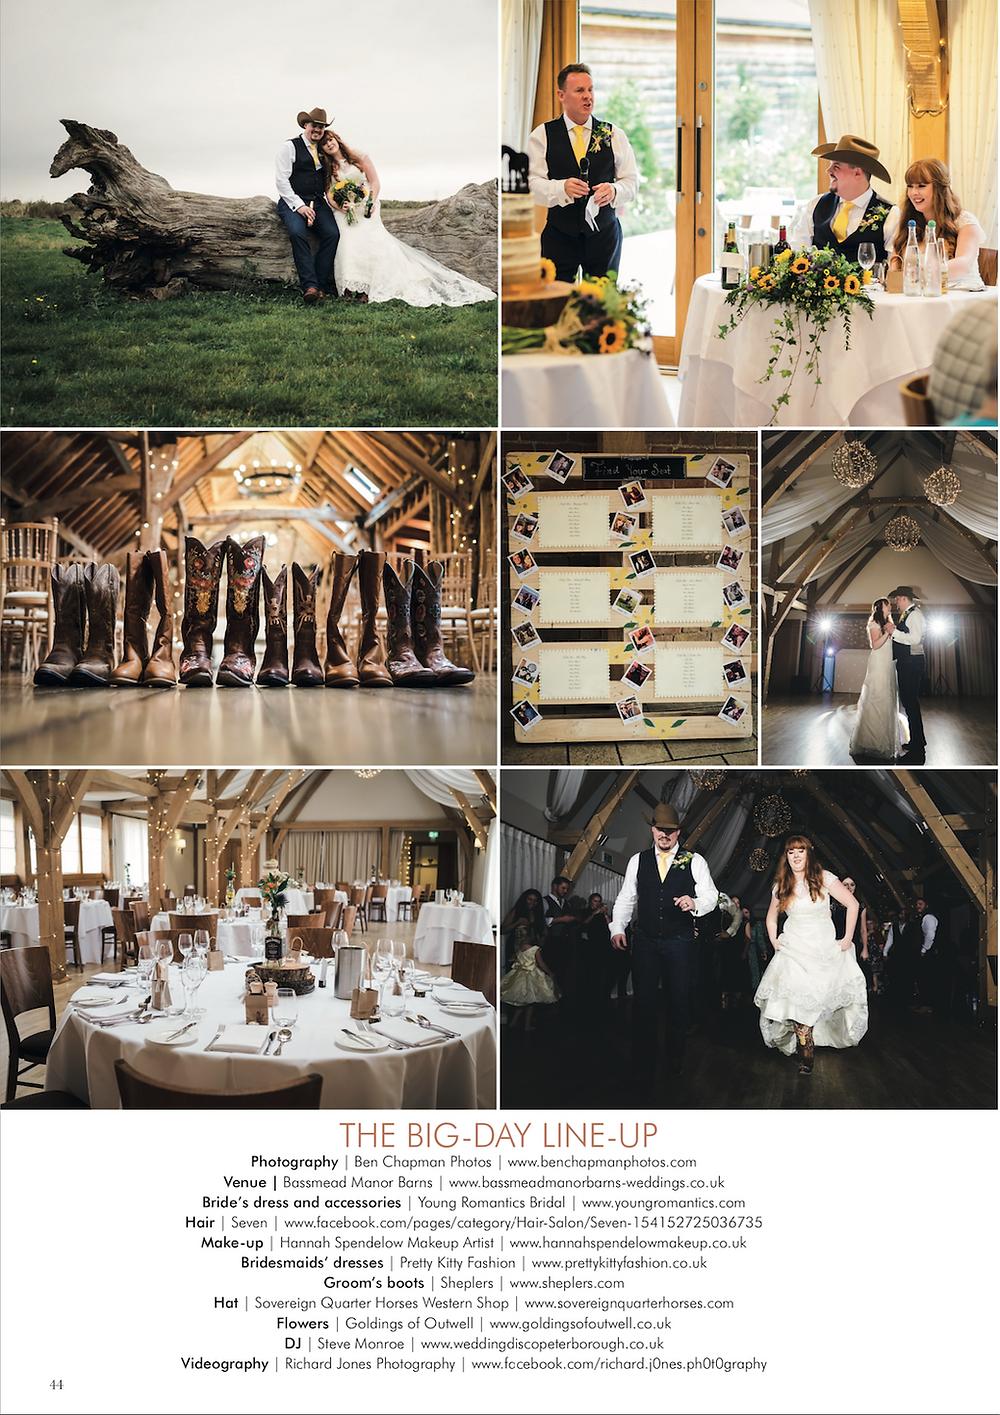 Kings Lynn wedding photographer published in wedding magazine